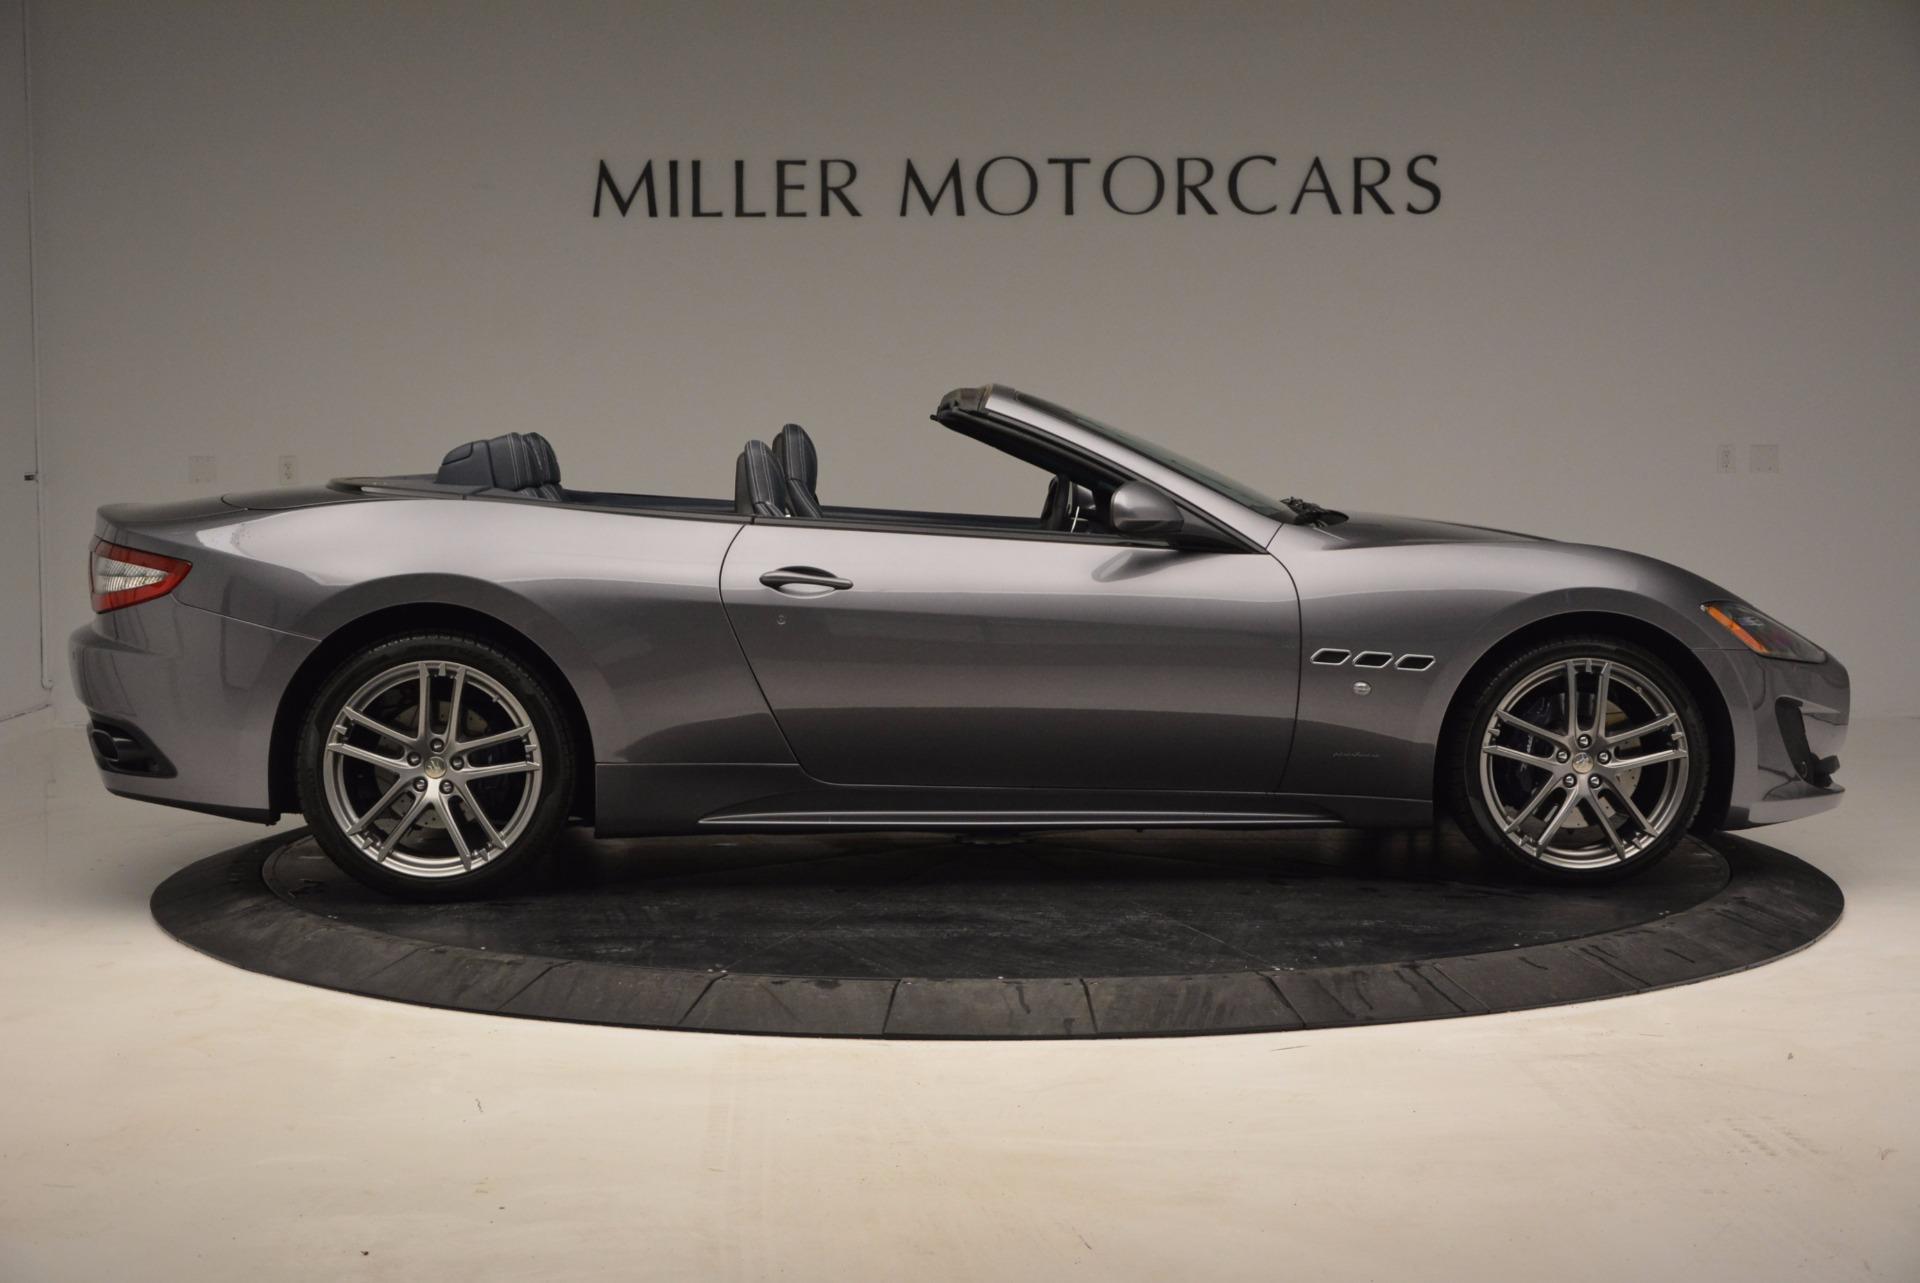 New 2016 Maserati GranTurismo Convertible Sport For Sale In Westport, CT 154_p6